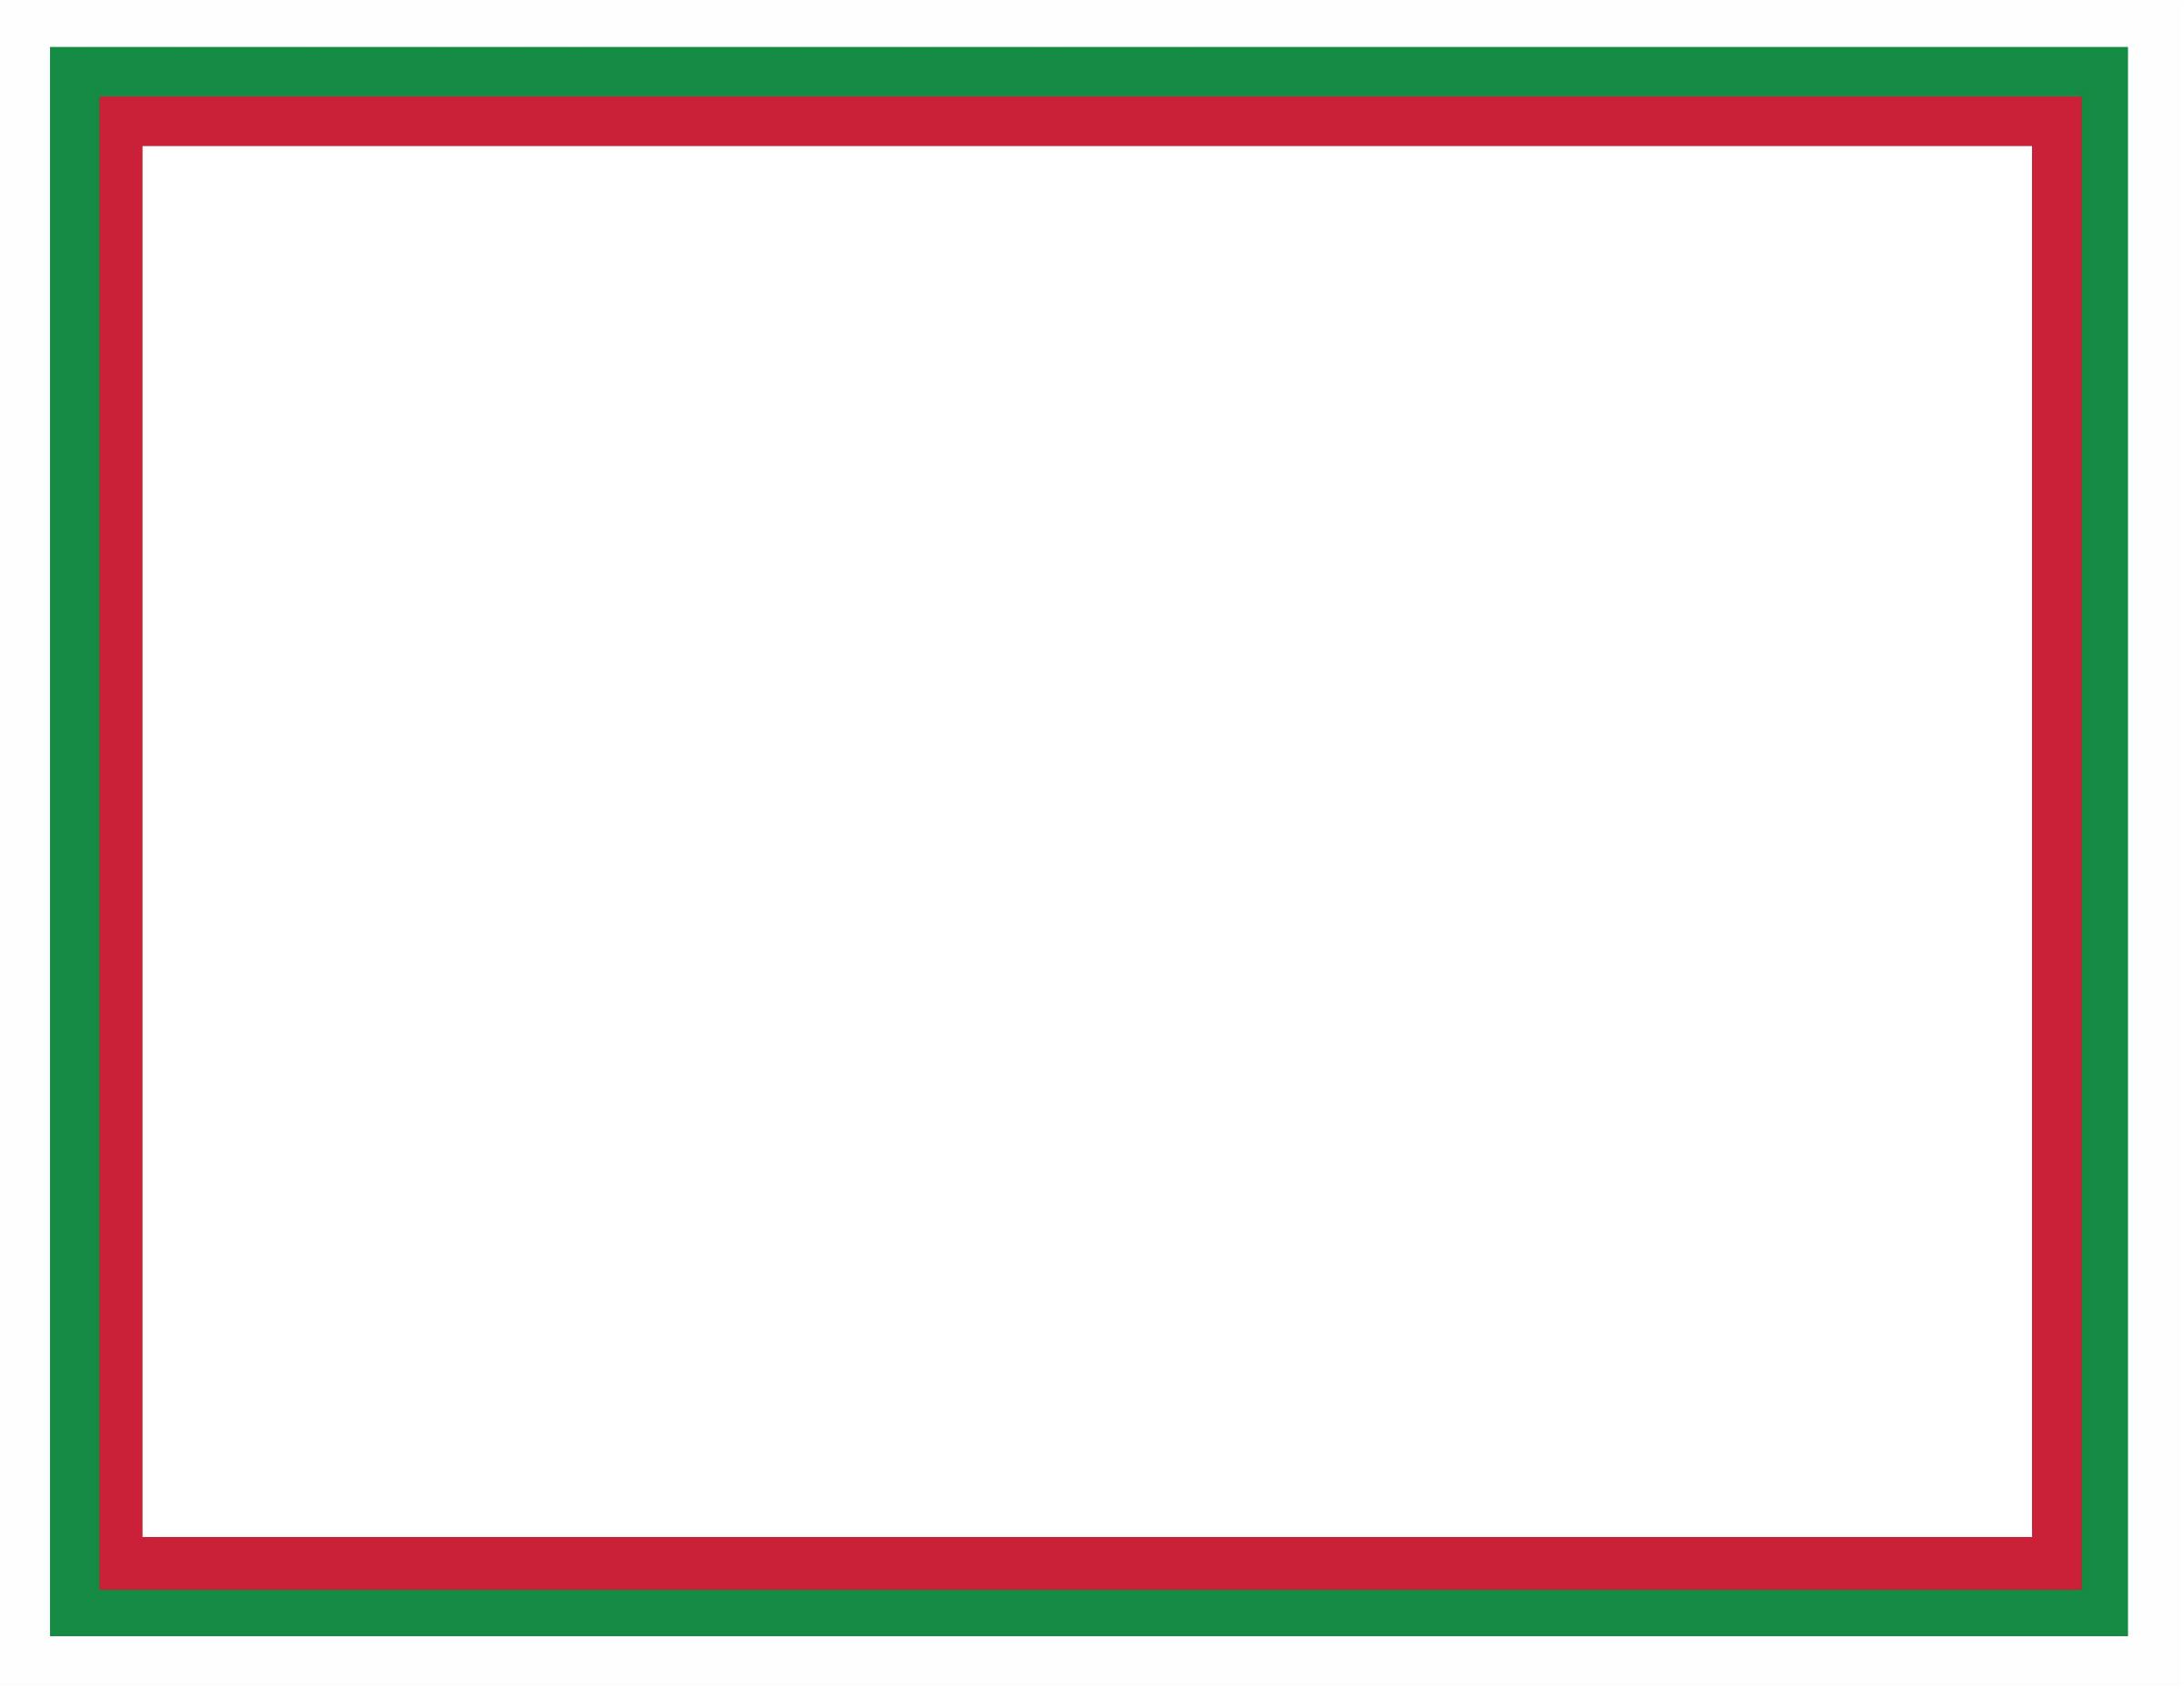 clipart christmas holiday frame border rh openclipart org christmas holiday border clipart Holiday Clip Art